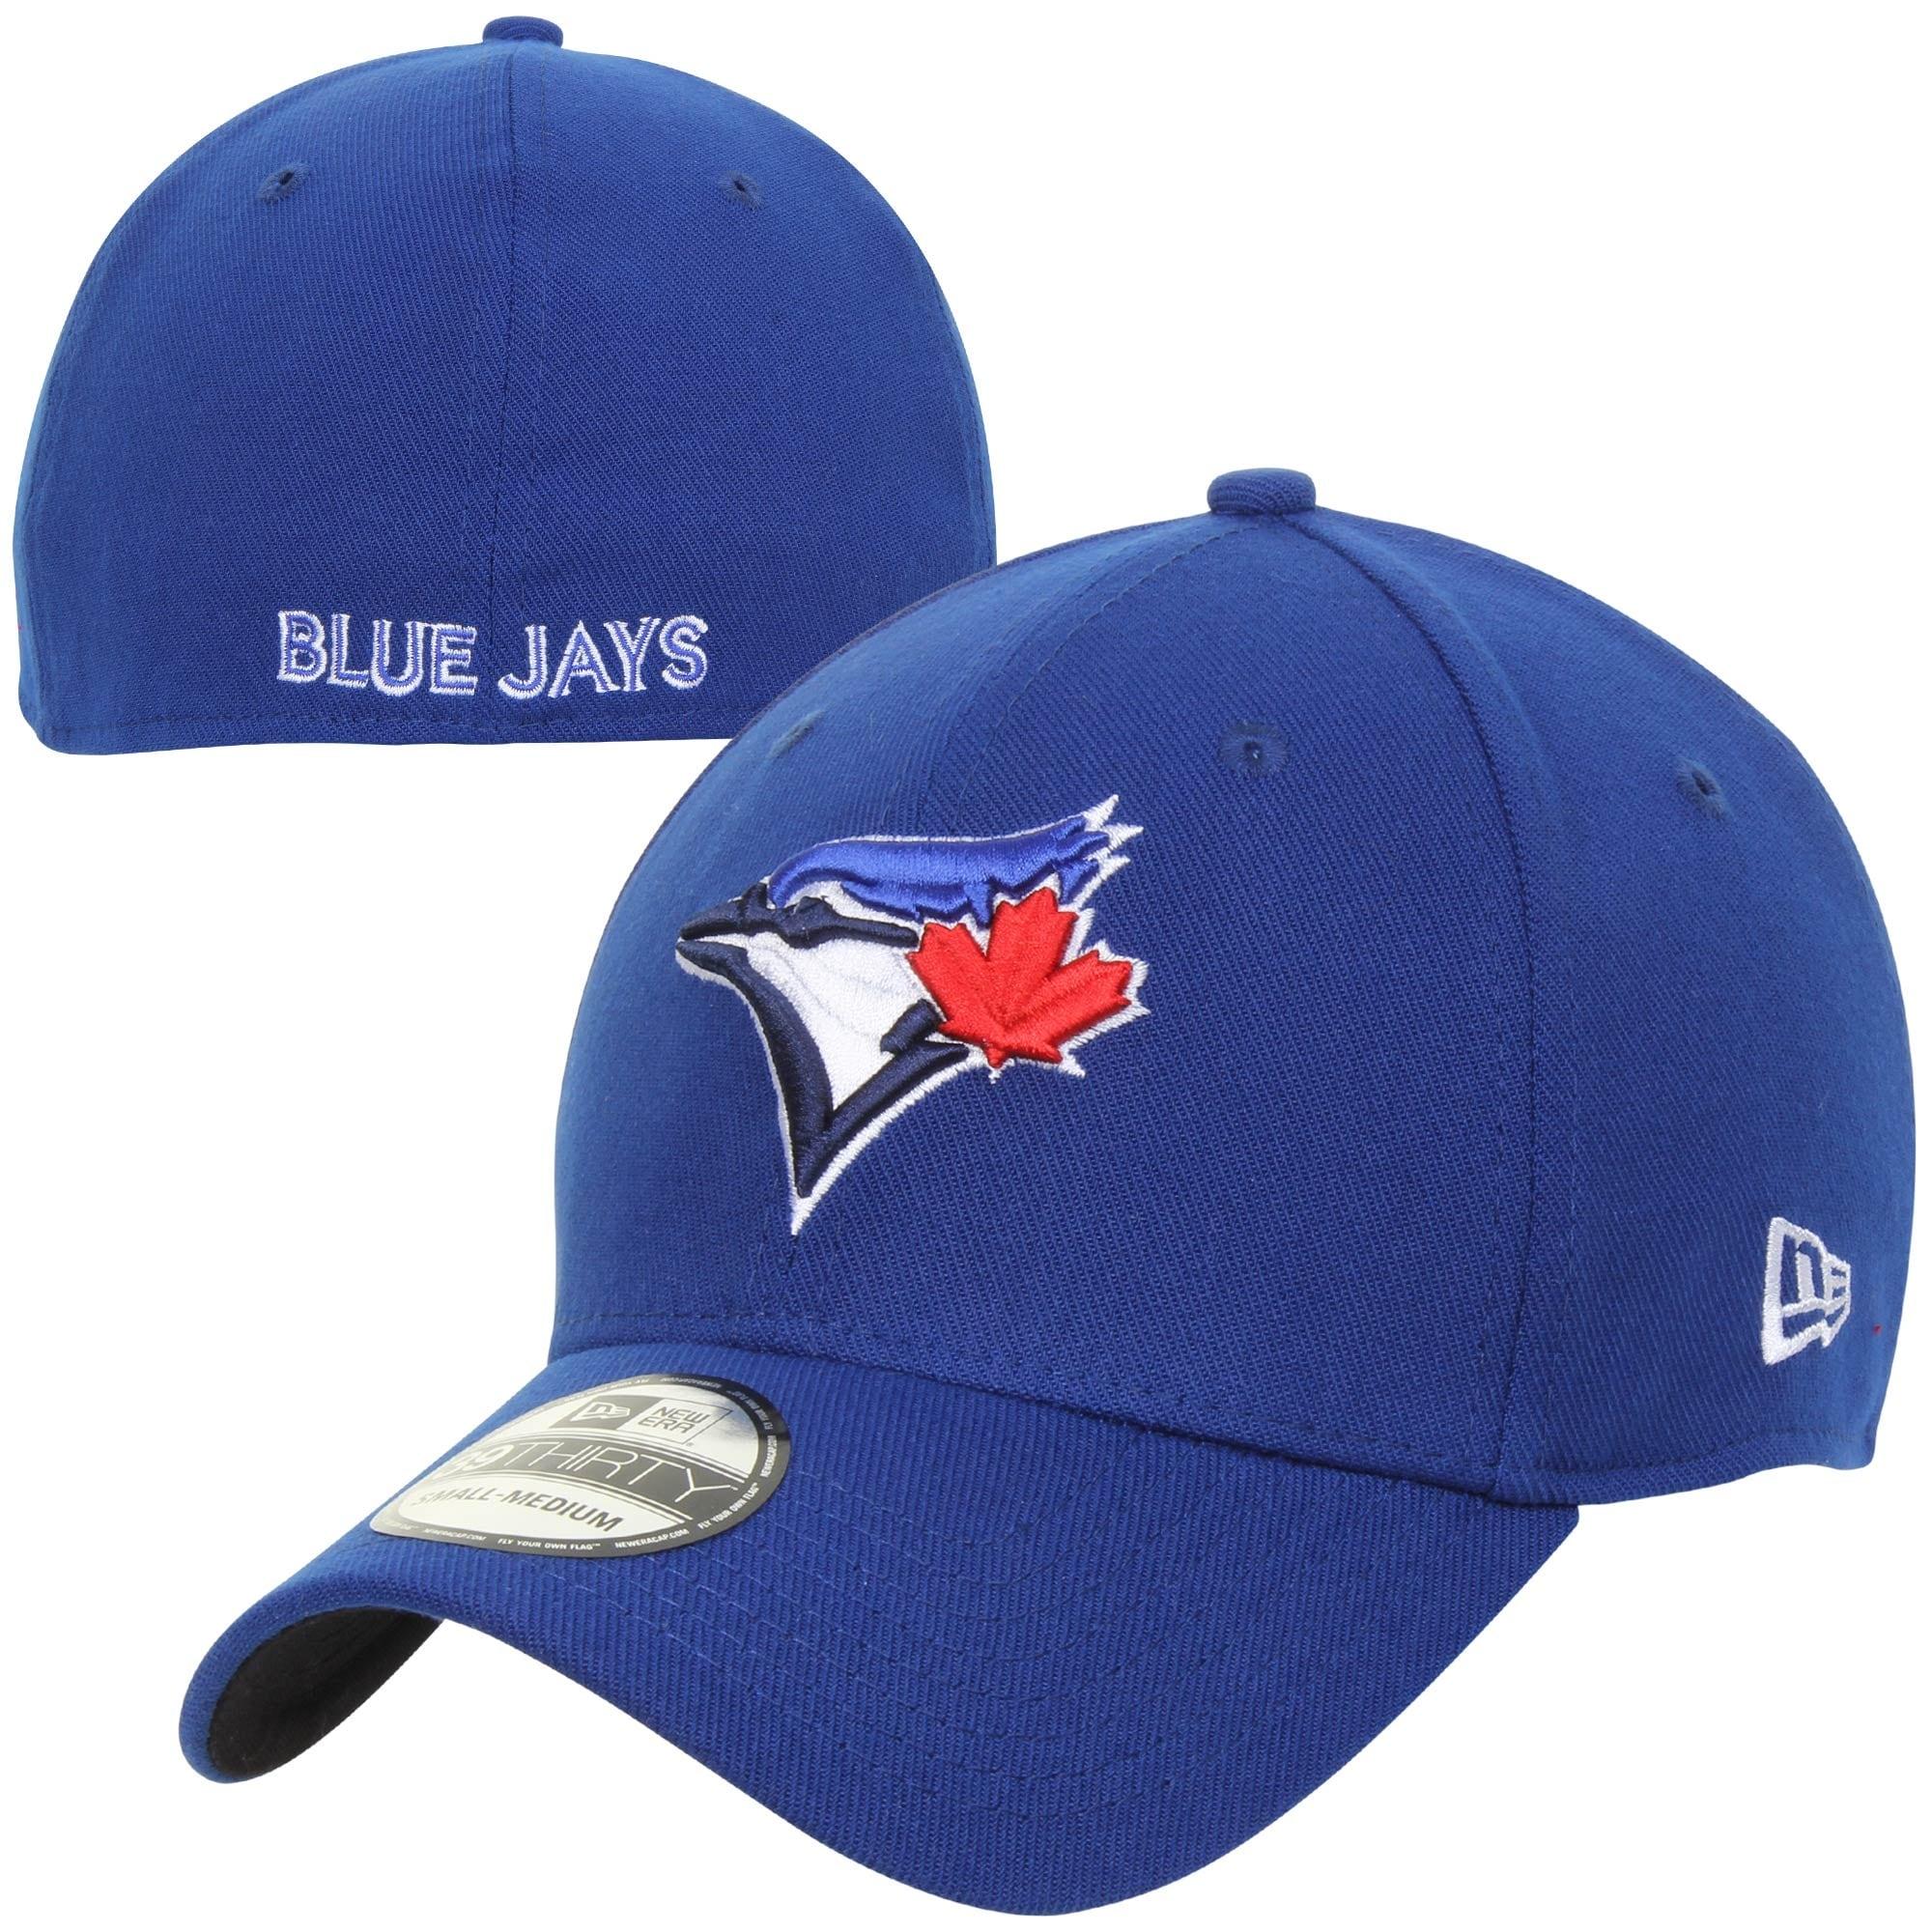 New Era Toronto Blue Jays MLB Team Classic 39THIRTY Flex Hat - Royal